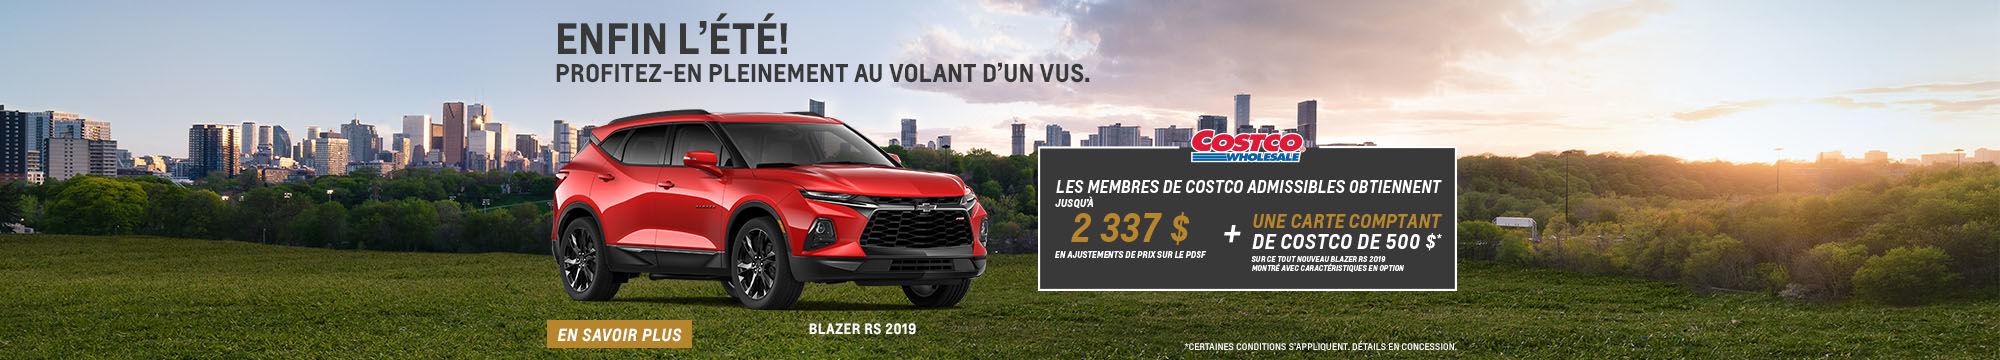 Costco - Prix préférentiel Chevrolet Blazer